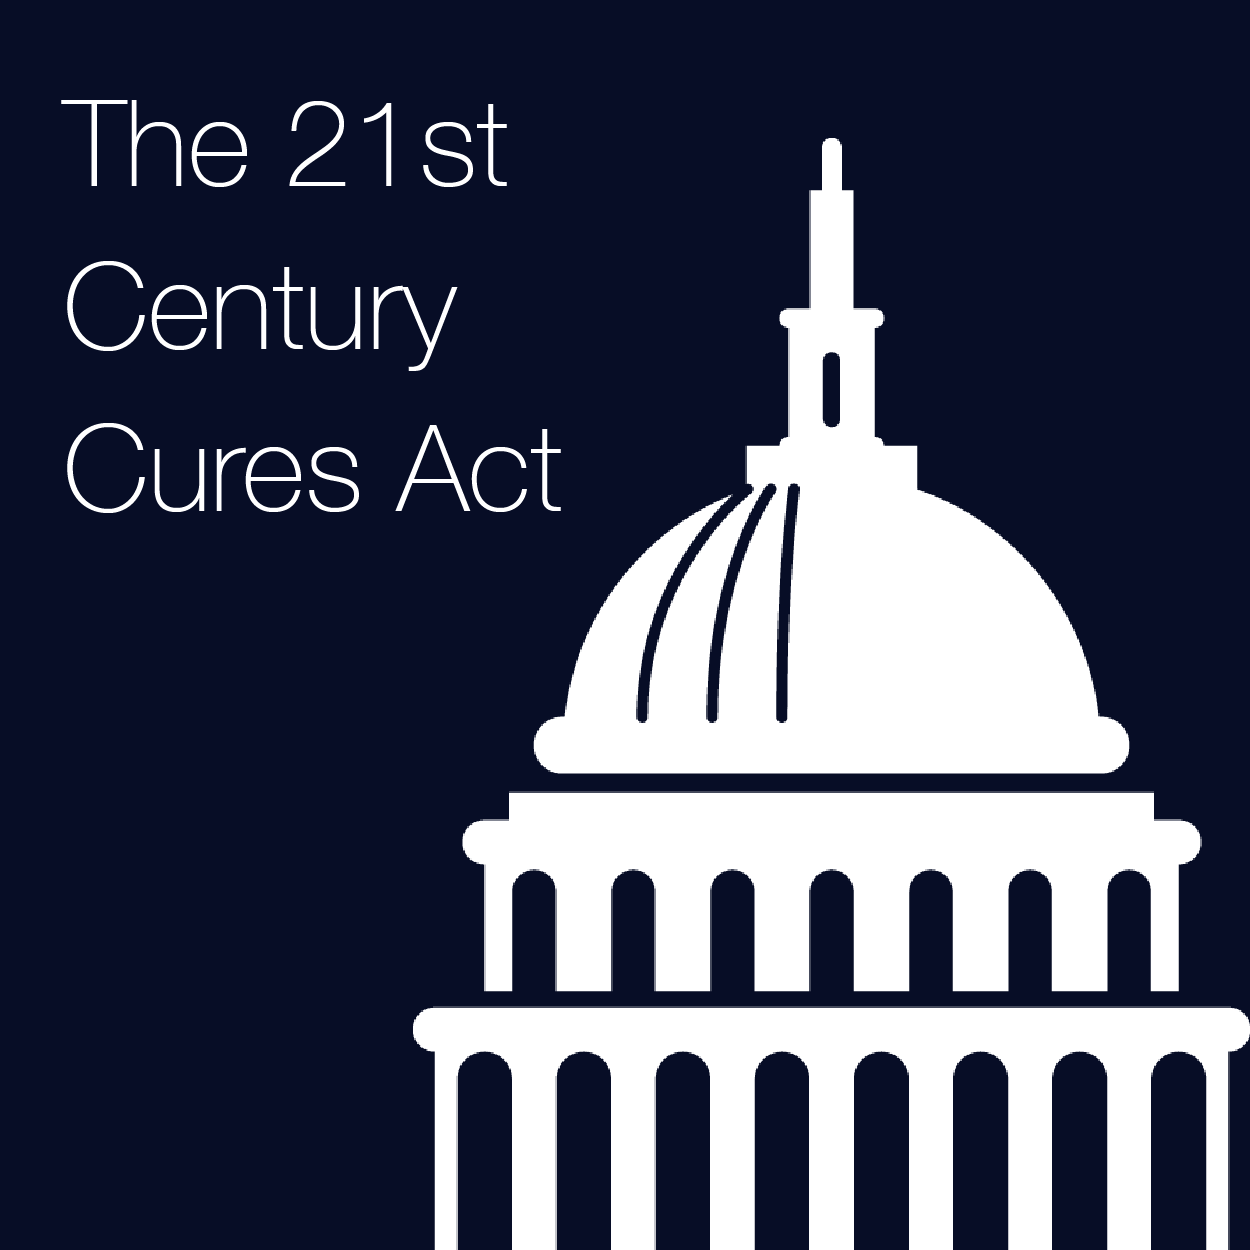 Summarizing The 21st Century Cures Act